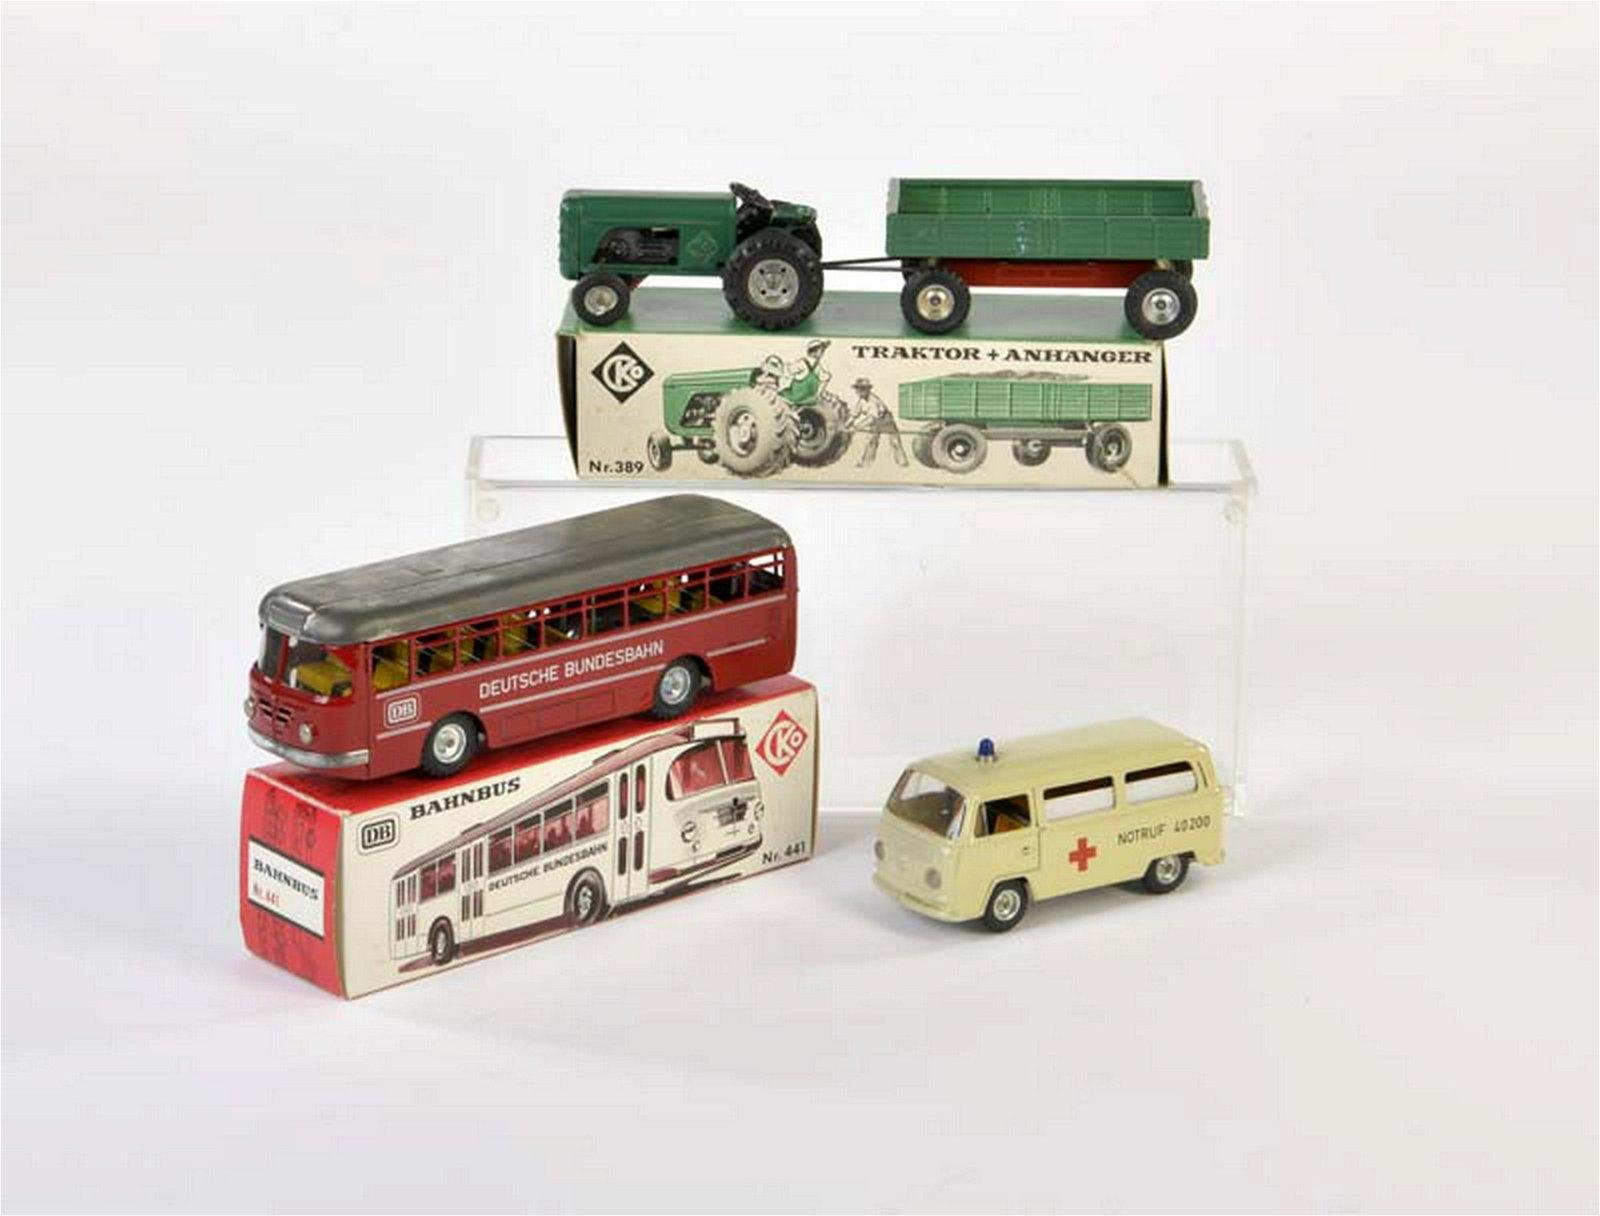 Kellermann, Bahnbus, VW Bus, Ambulanz + Traktor mit